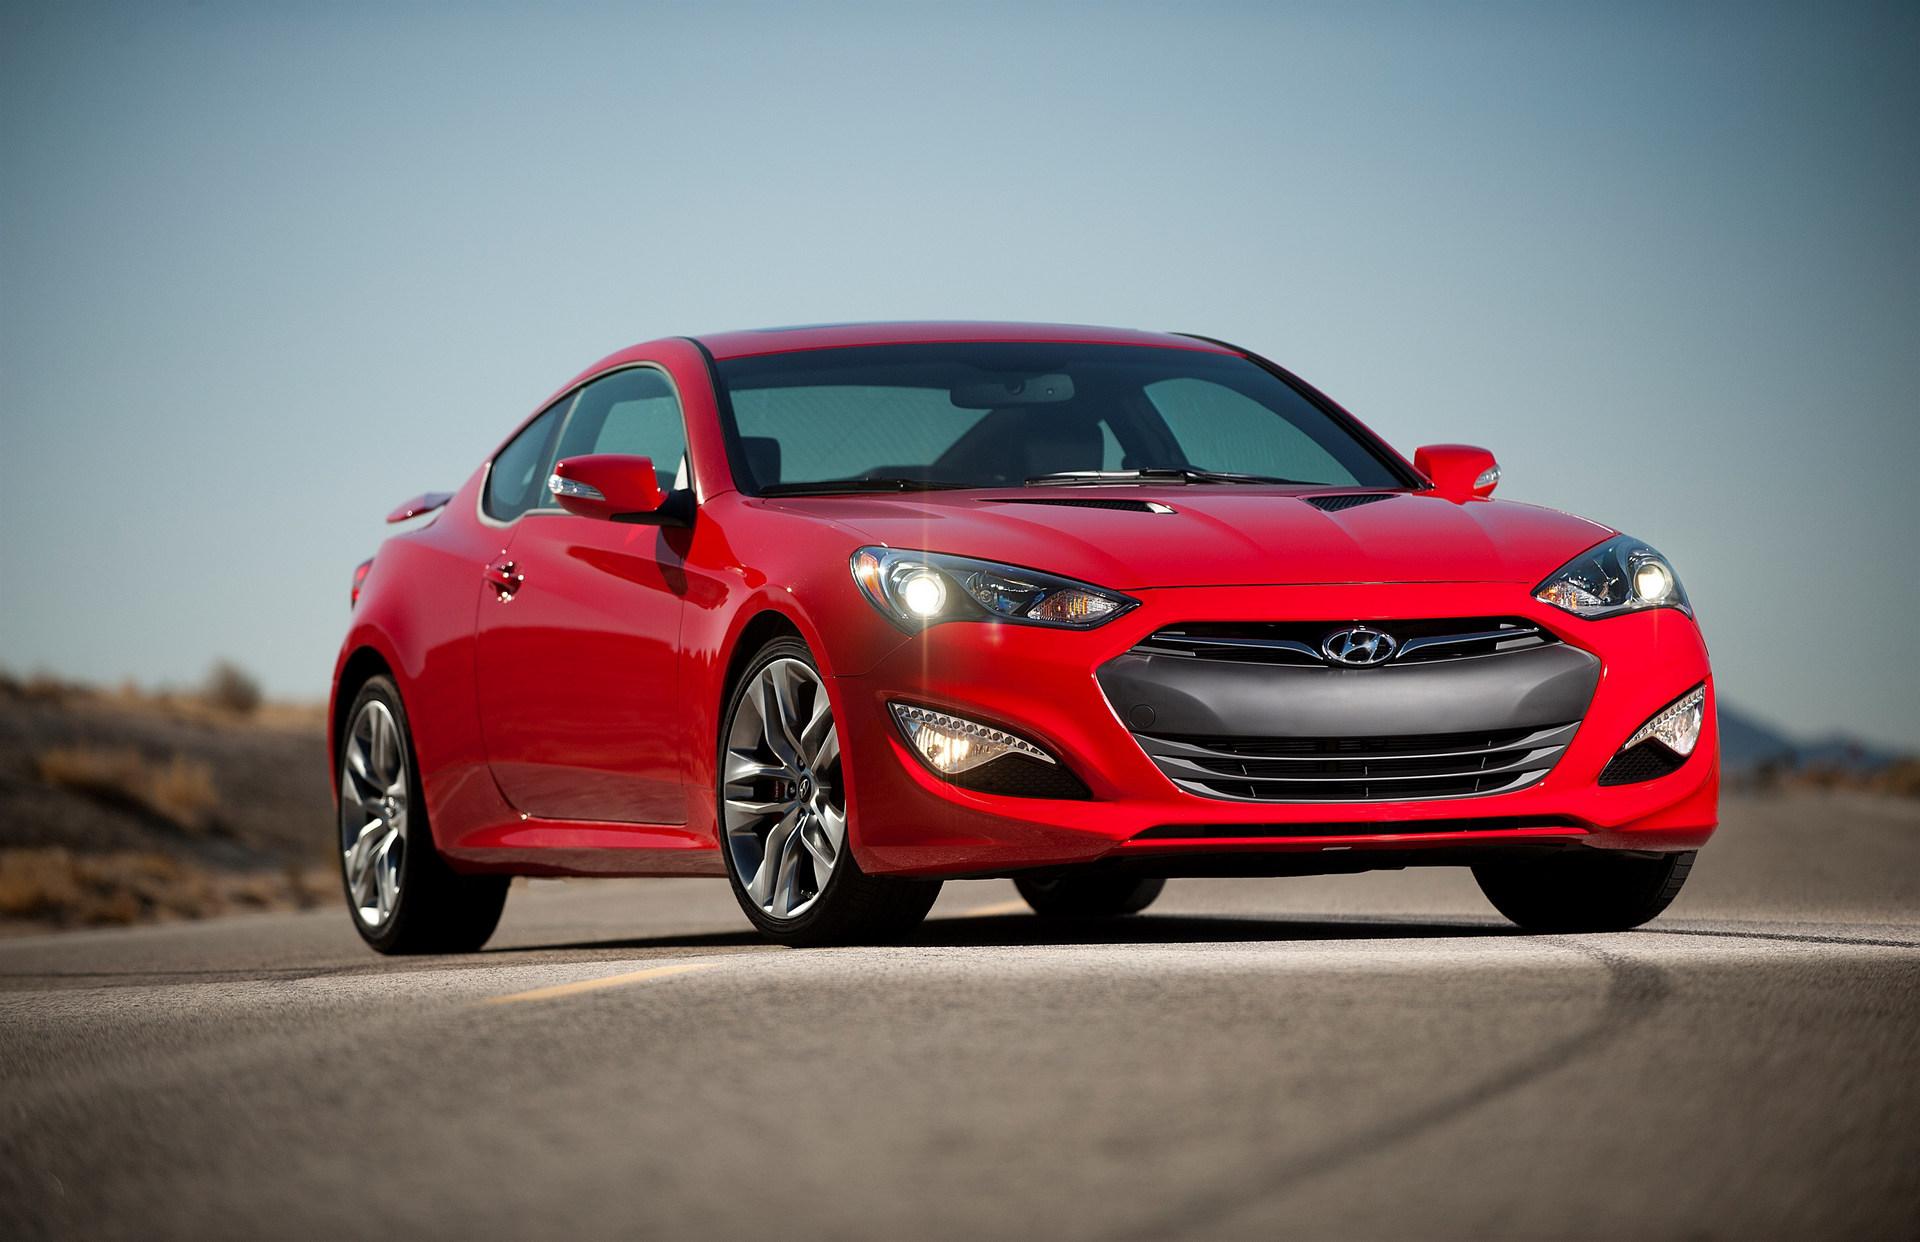 2015 Hyundai Genesis Coupe © Hyundai Motor Company